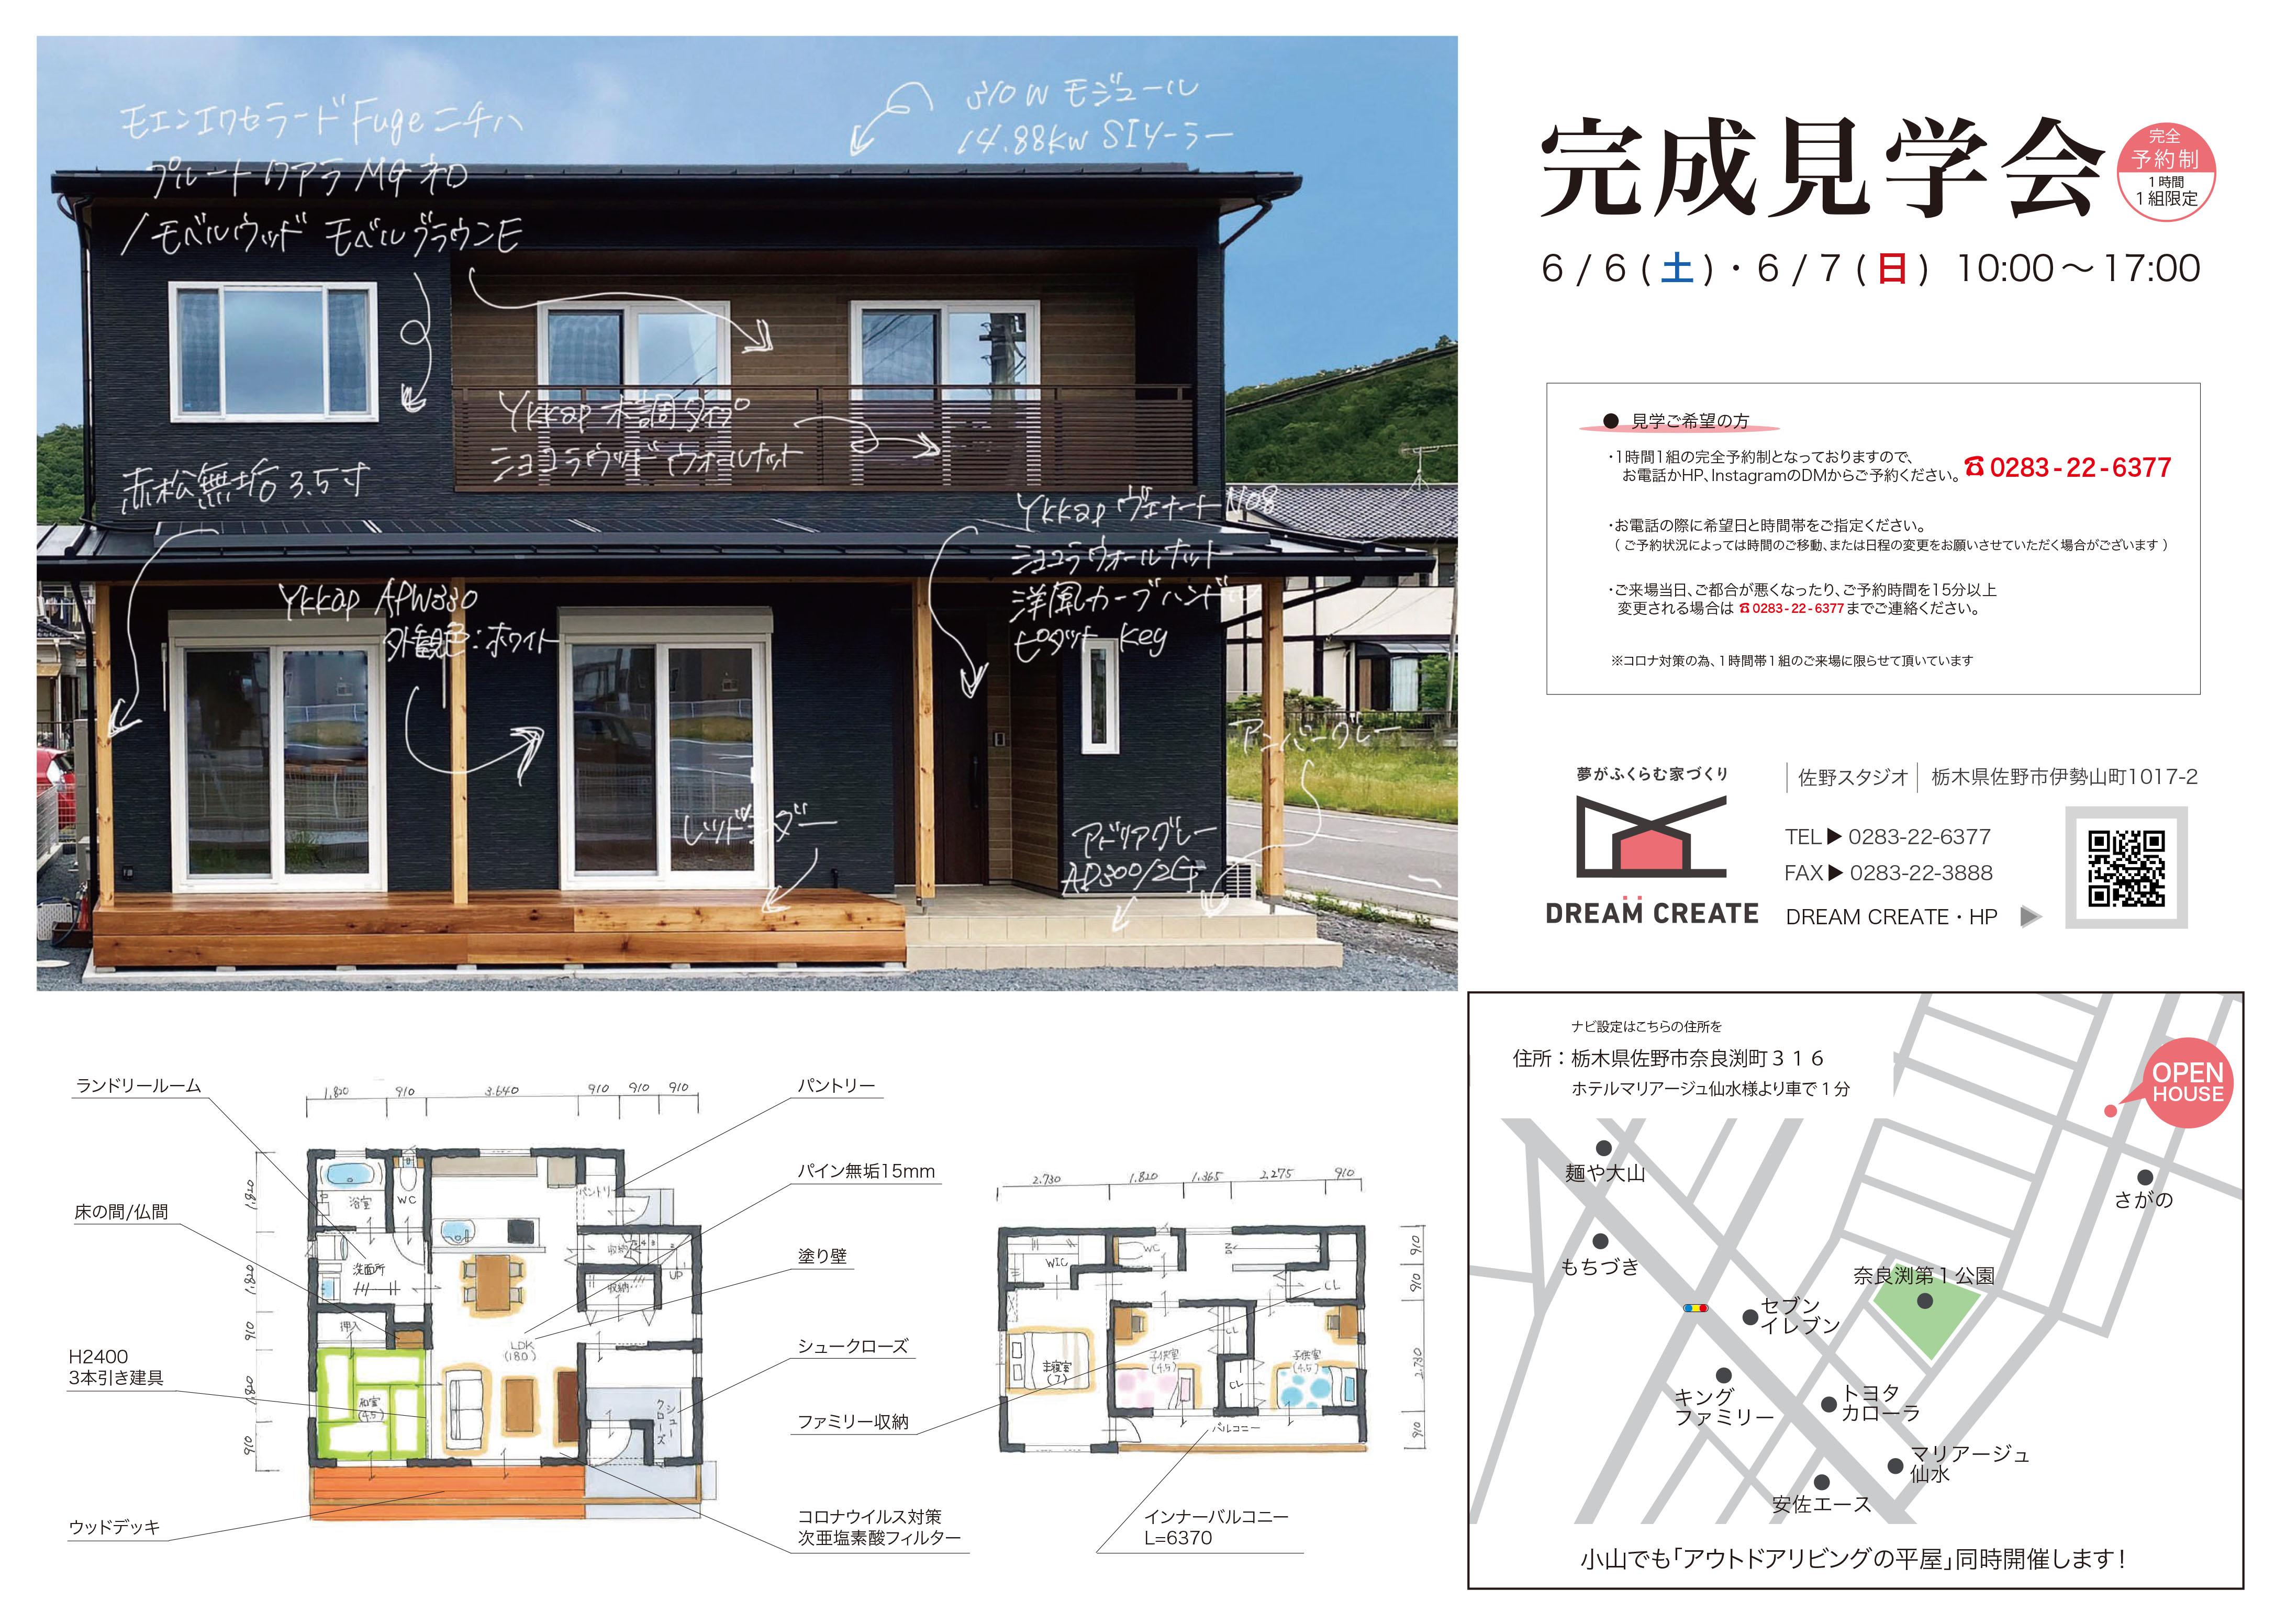 横塚様邸完成見学会チラシ_表_修正